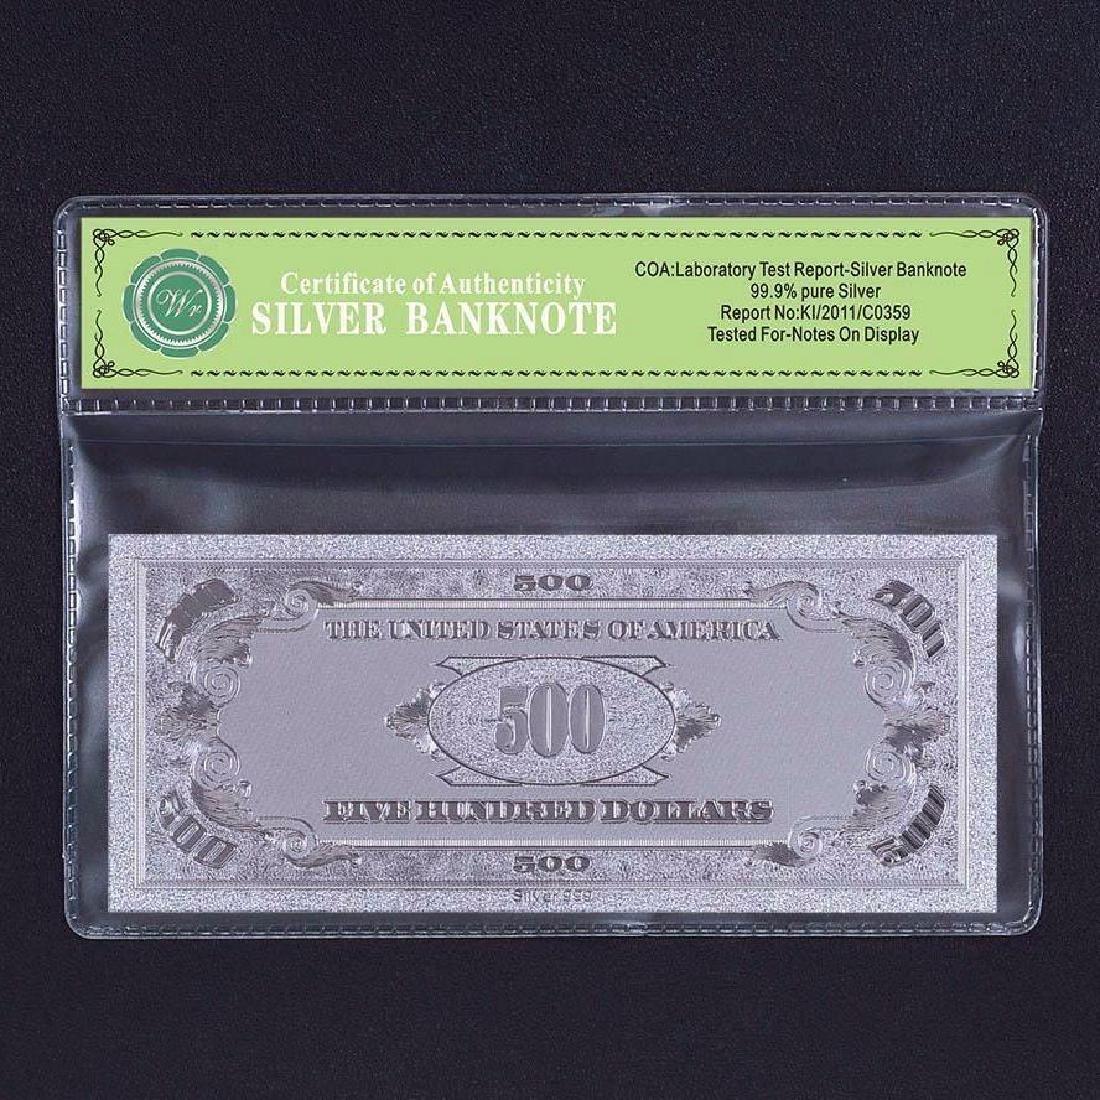 USA $500 24K Silver Clad Banknote - 2